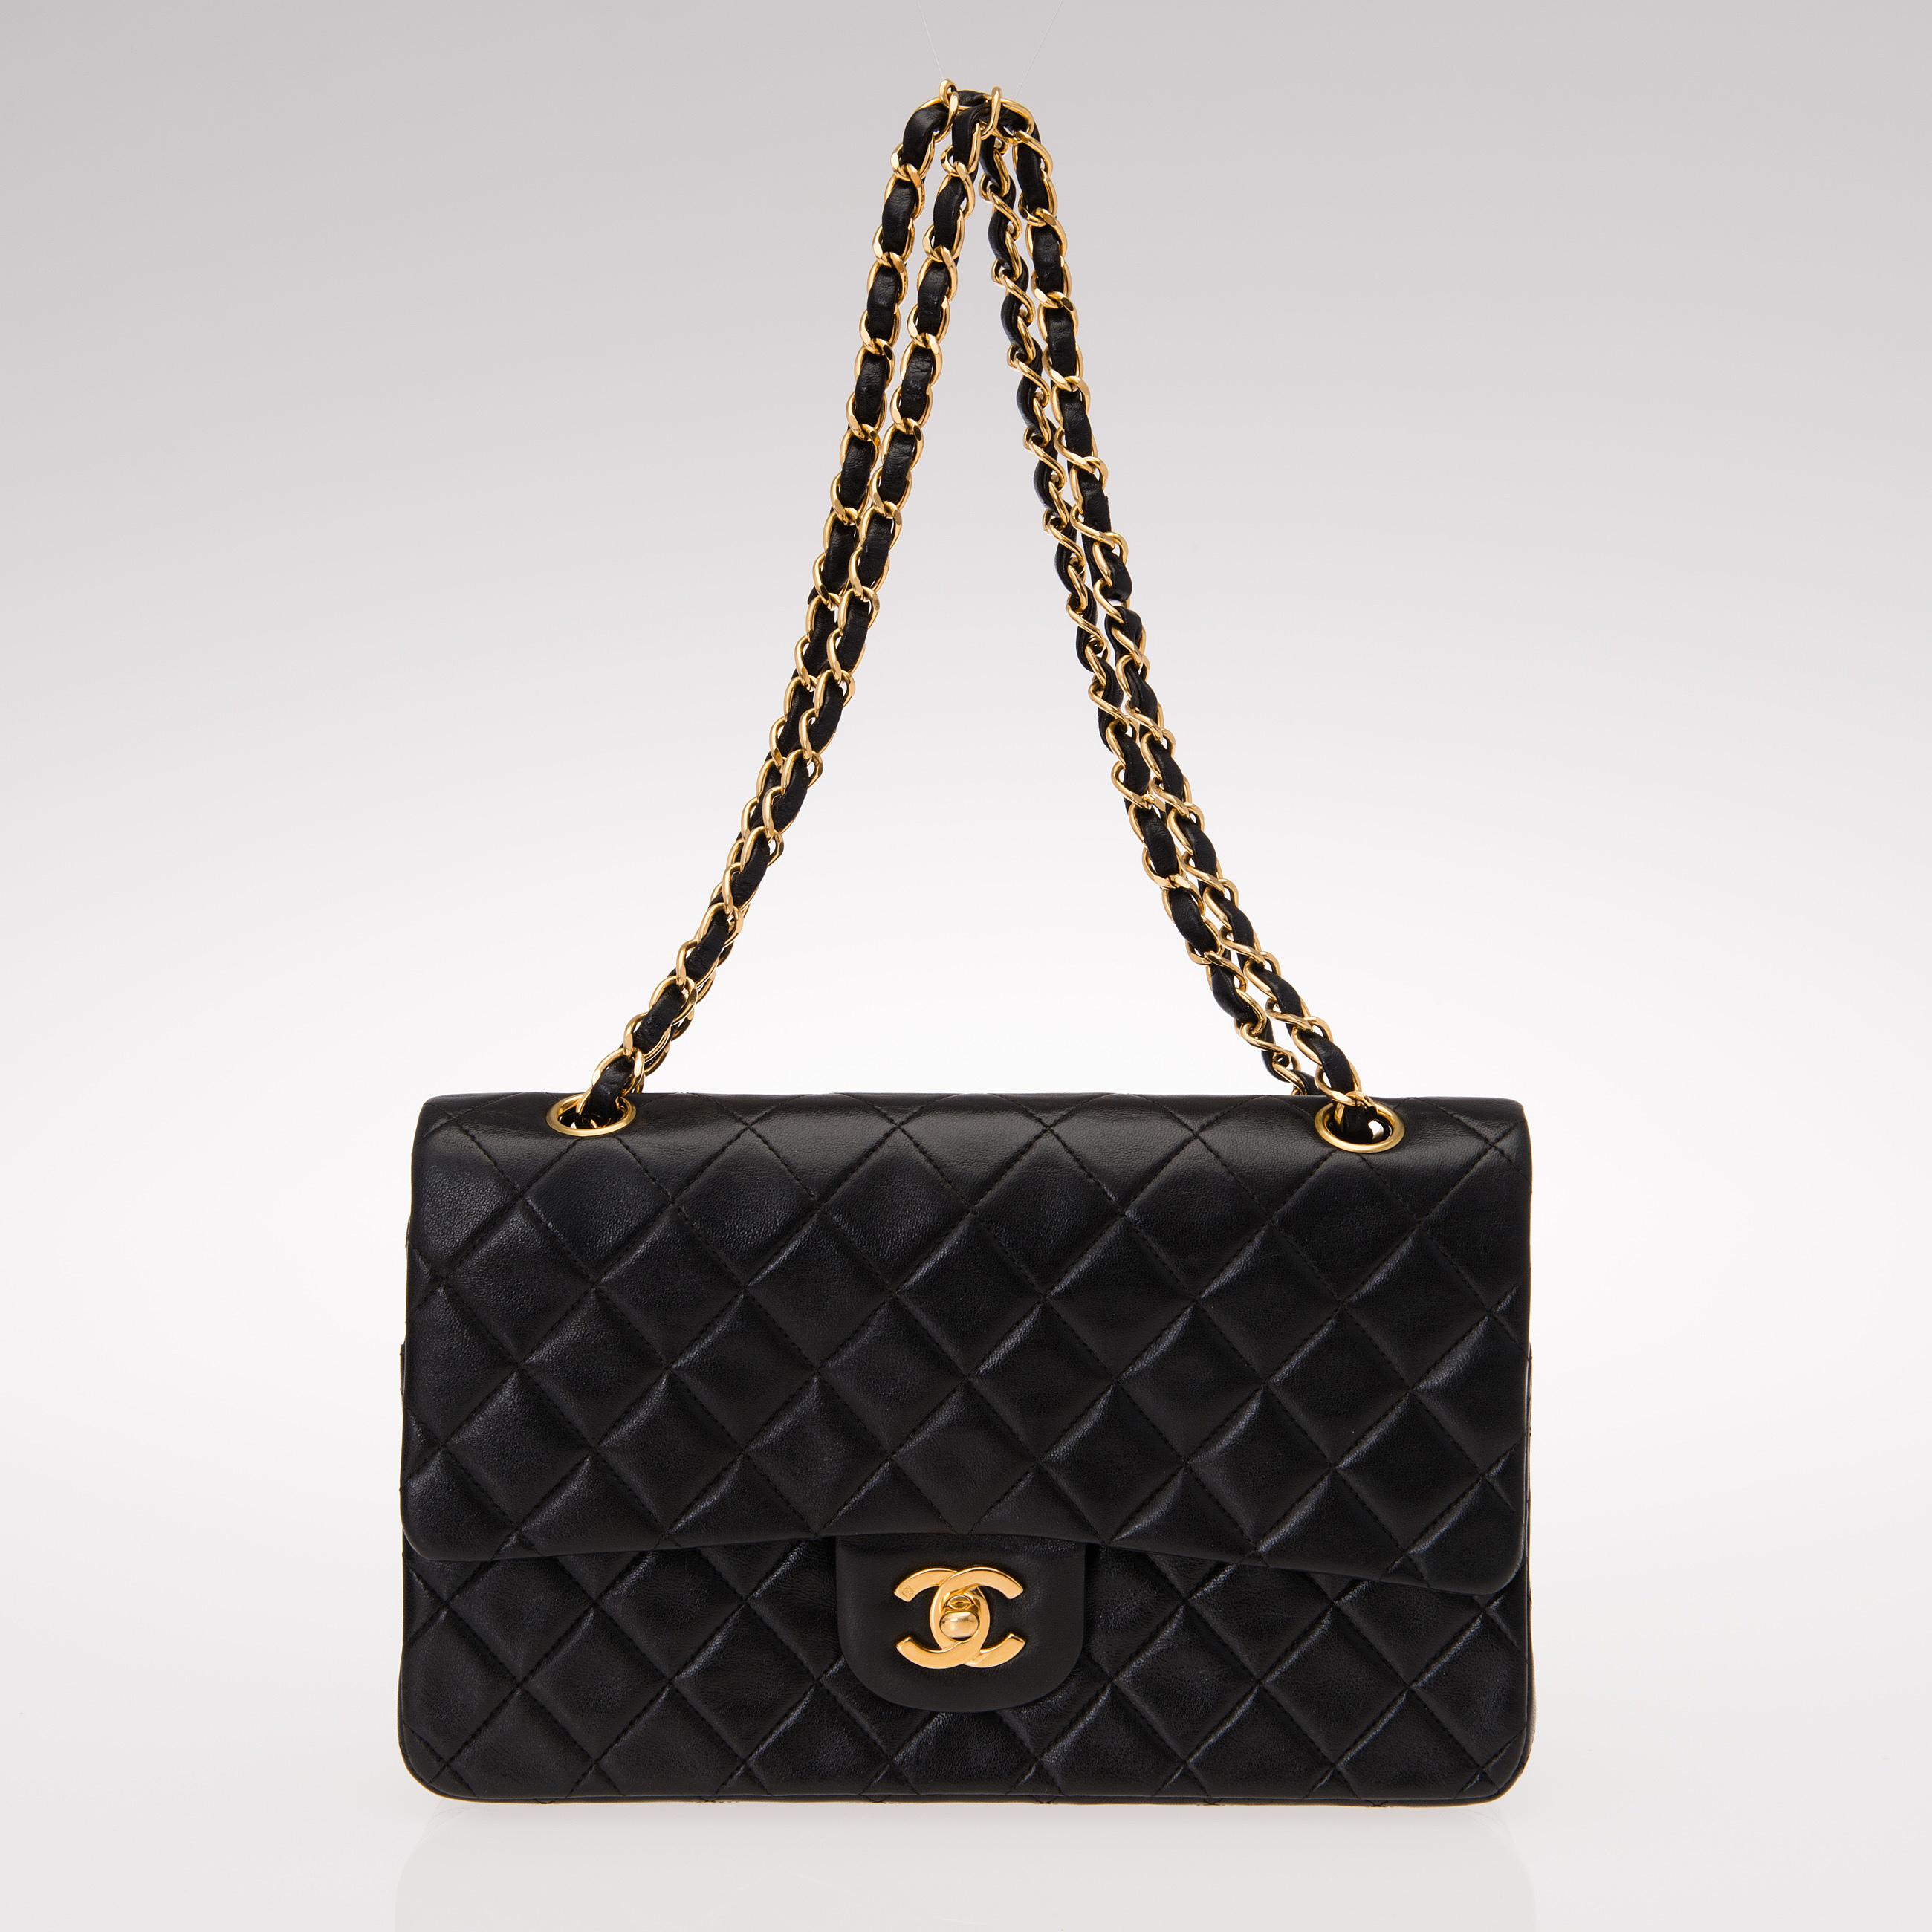 Ostetaan Chanel Laukku : Laukku quot double flap bag chanel bukowskis